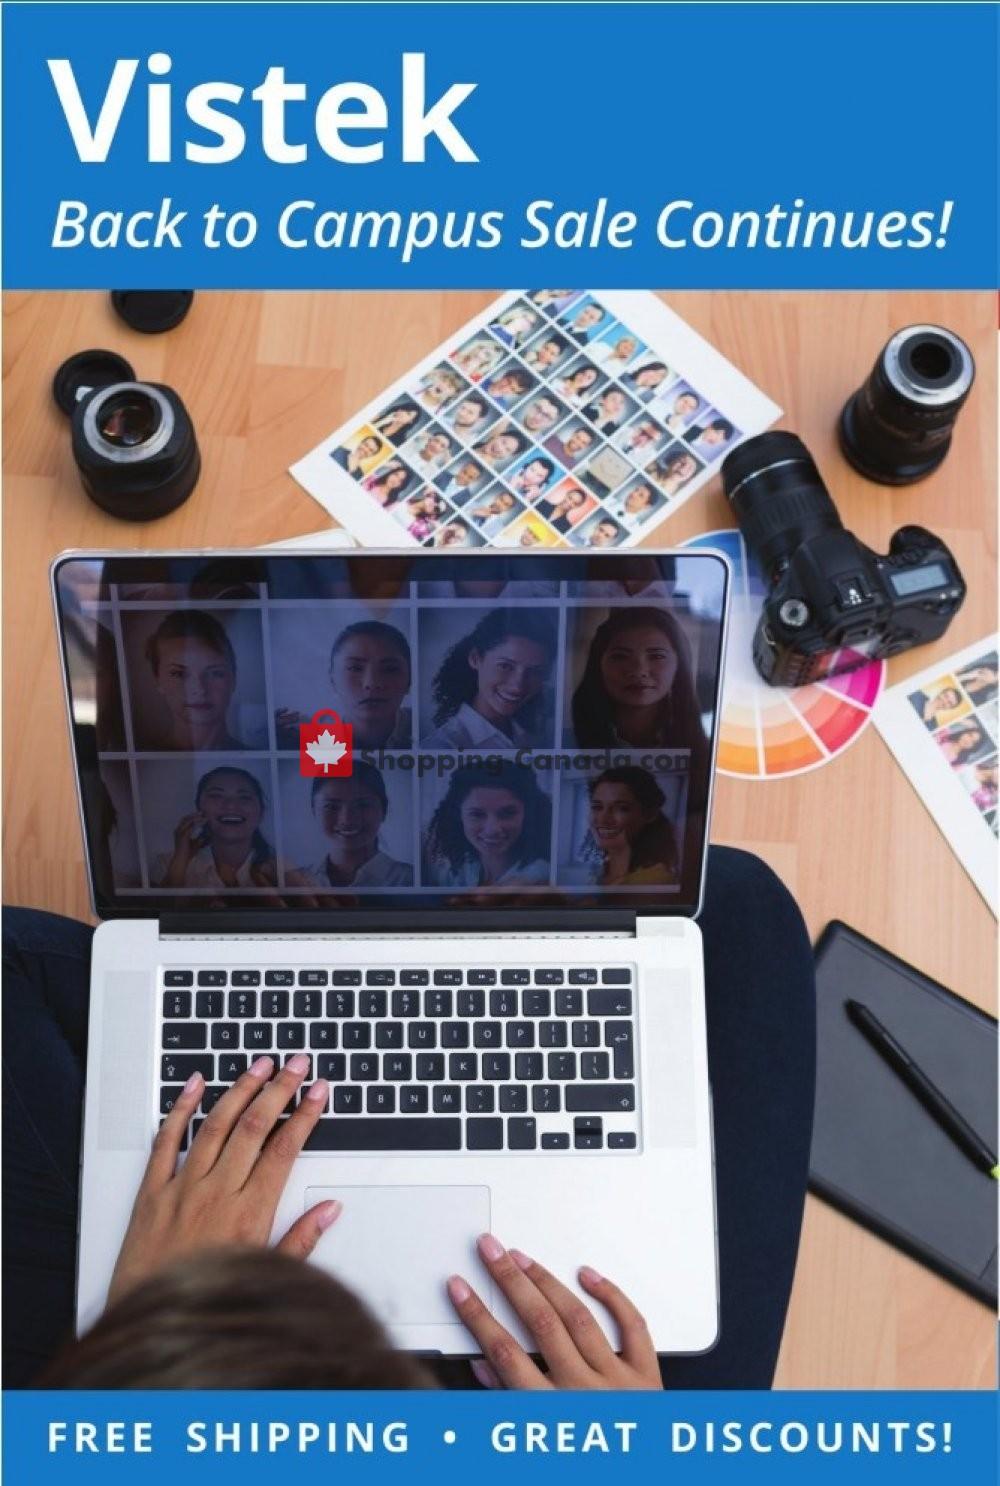 Flyer Vistek Canada - from Sunday September 1, 2019 to Monday September 30, 2019